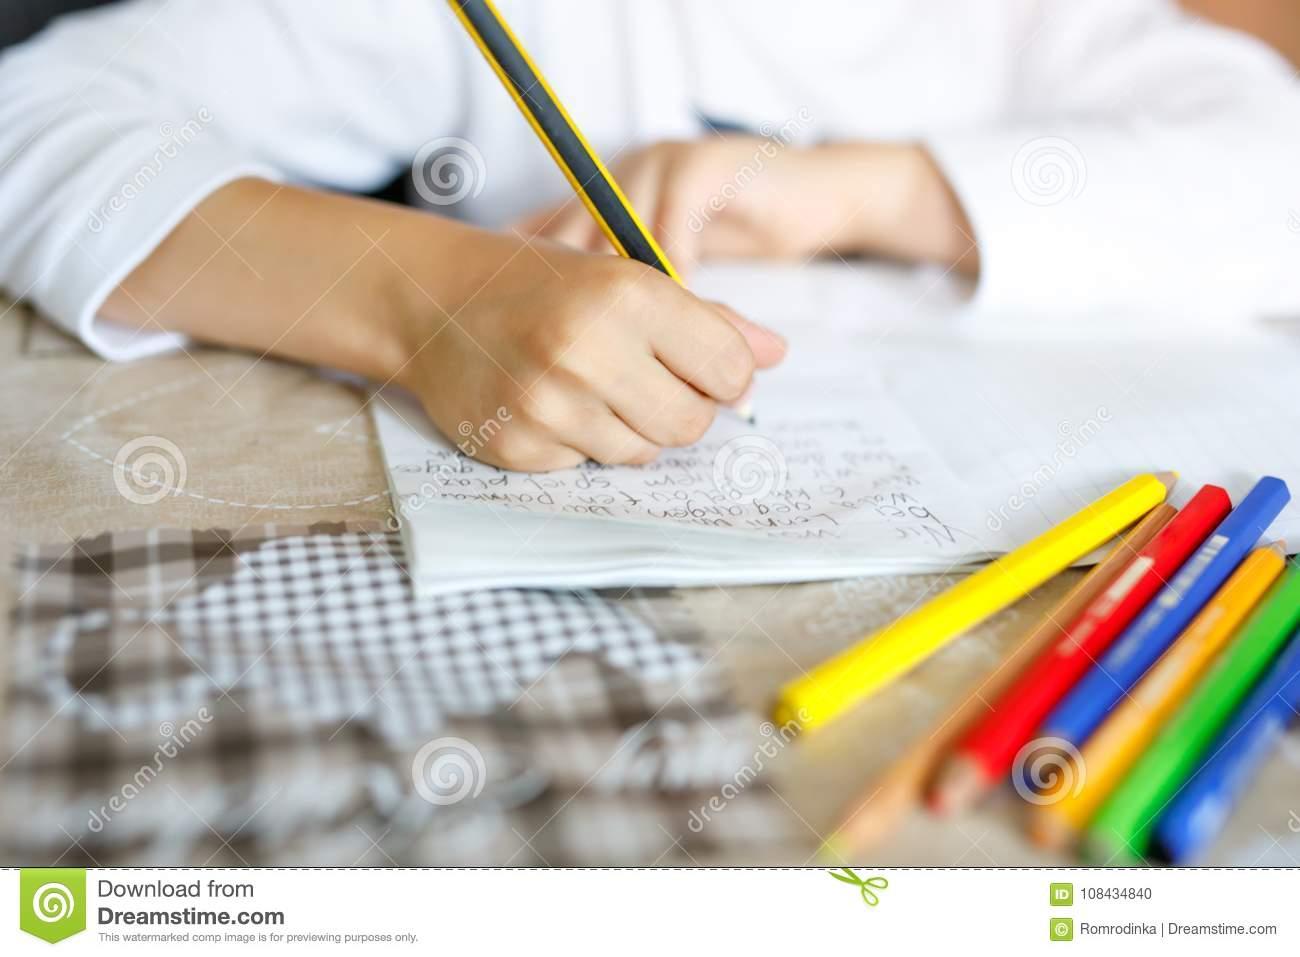 Study design dissertation